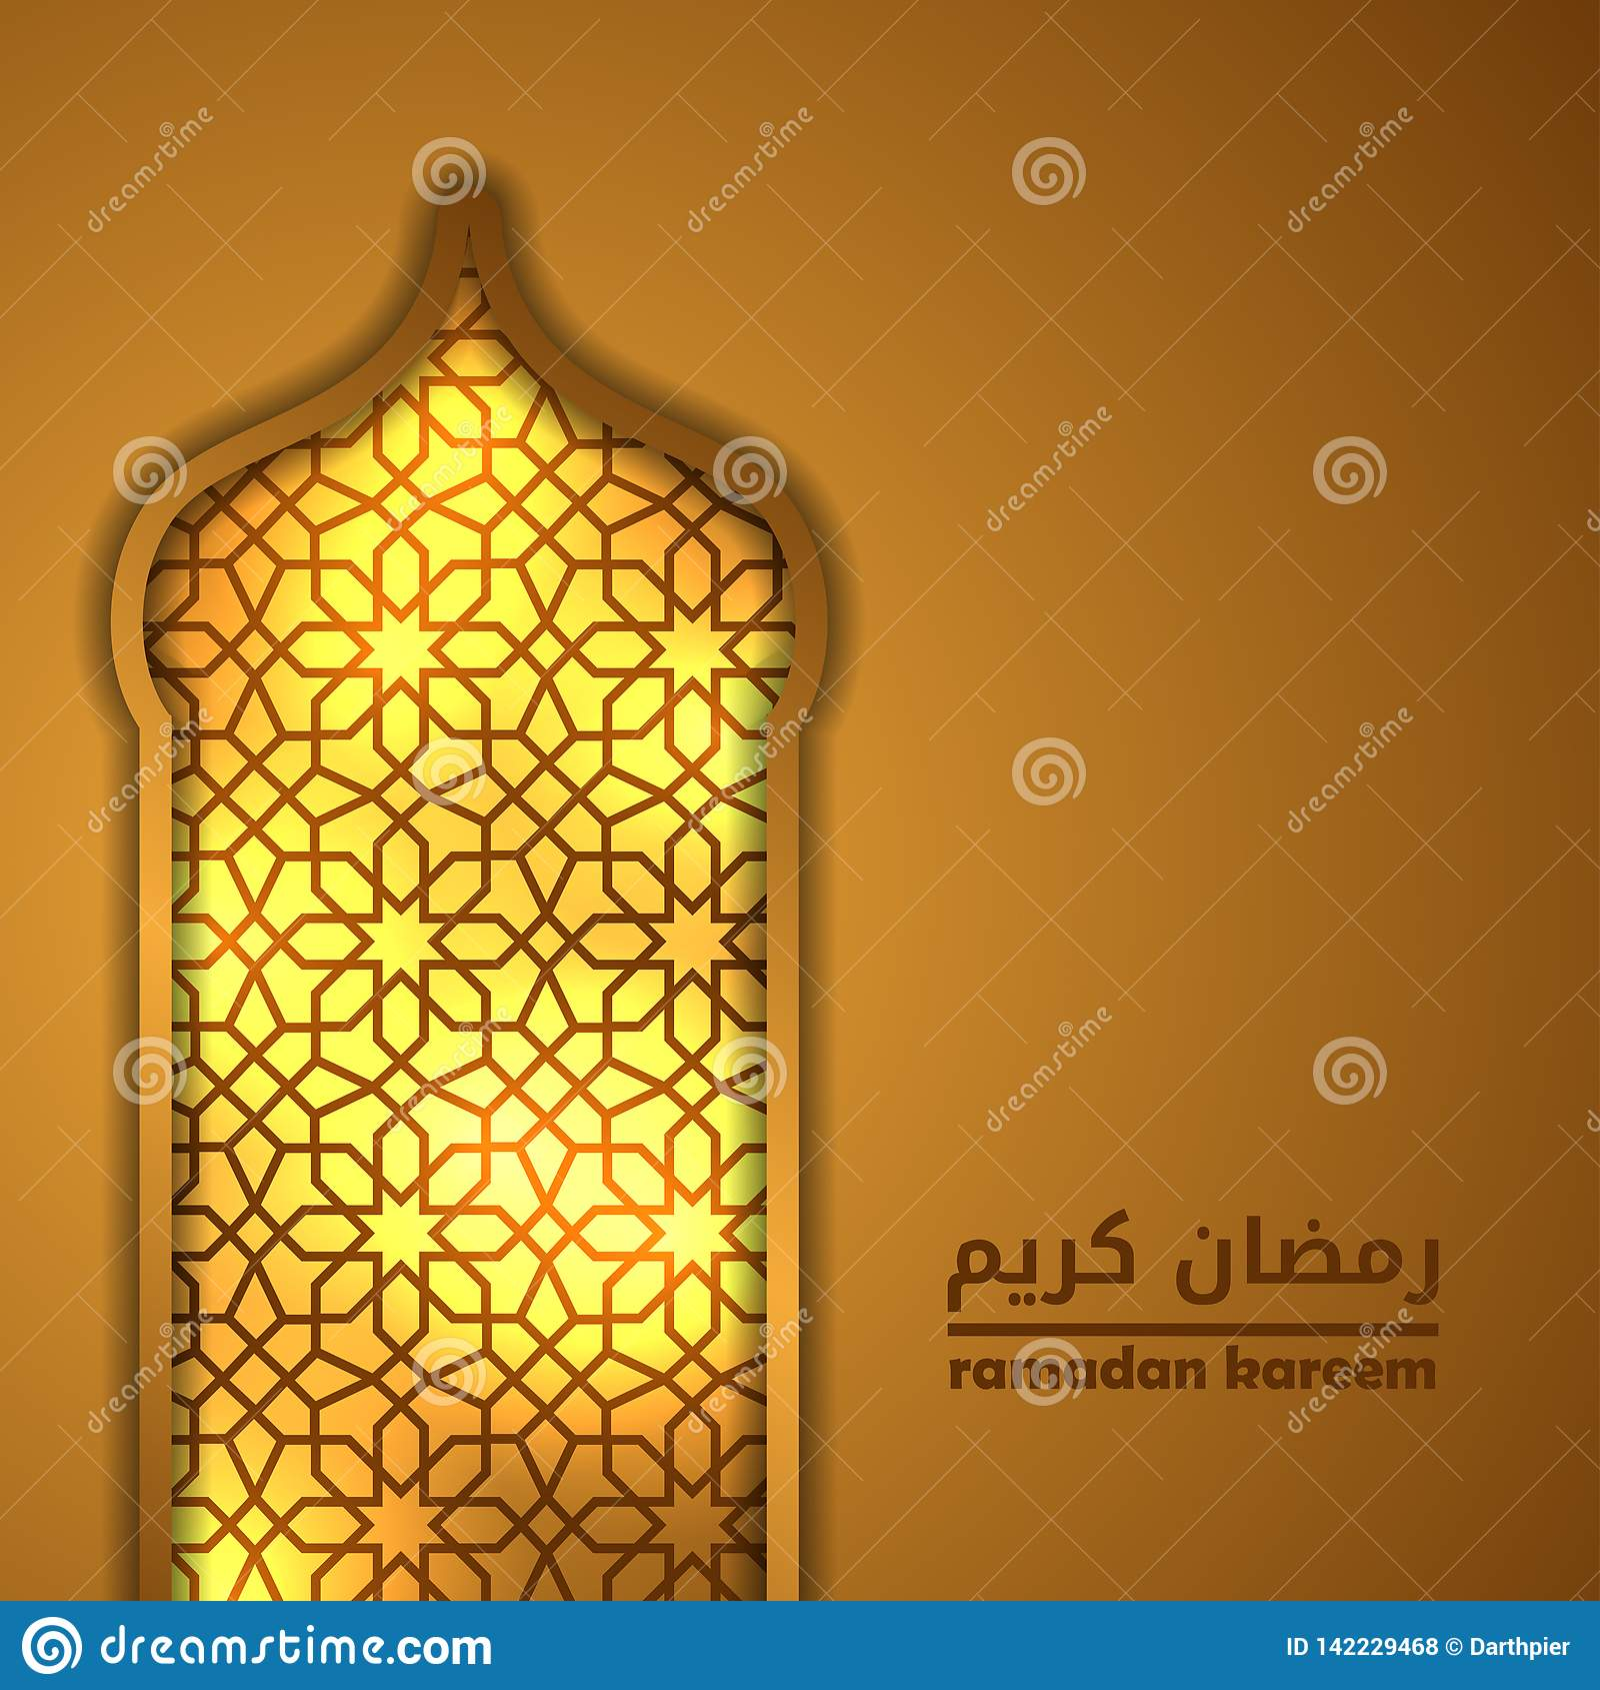 Ramadan Mubarak Banner with Mosque Figures